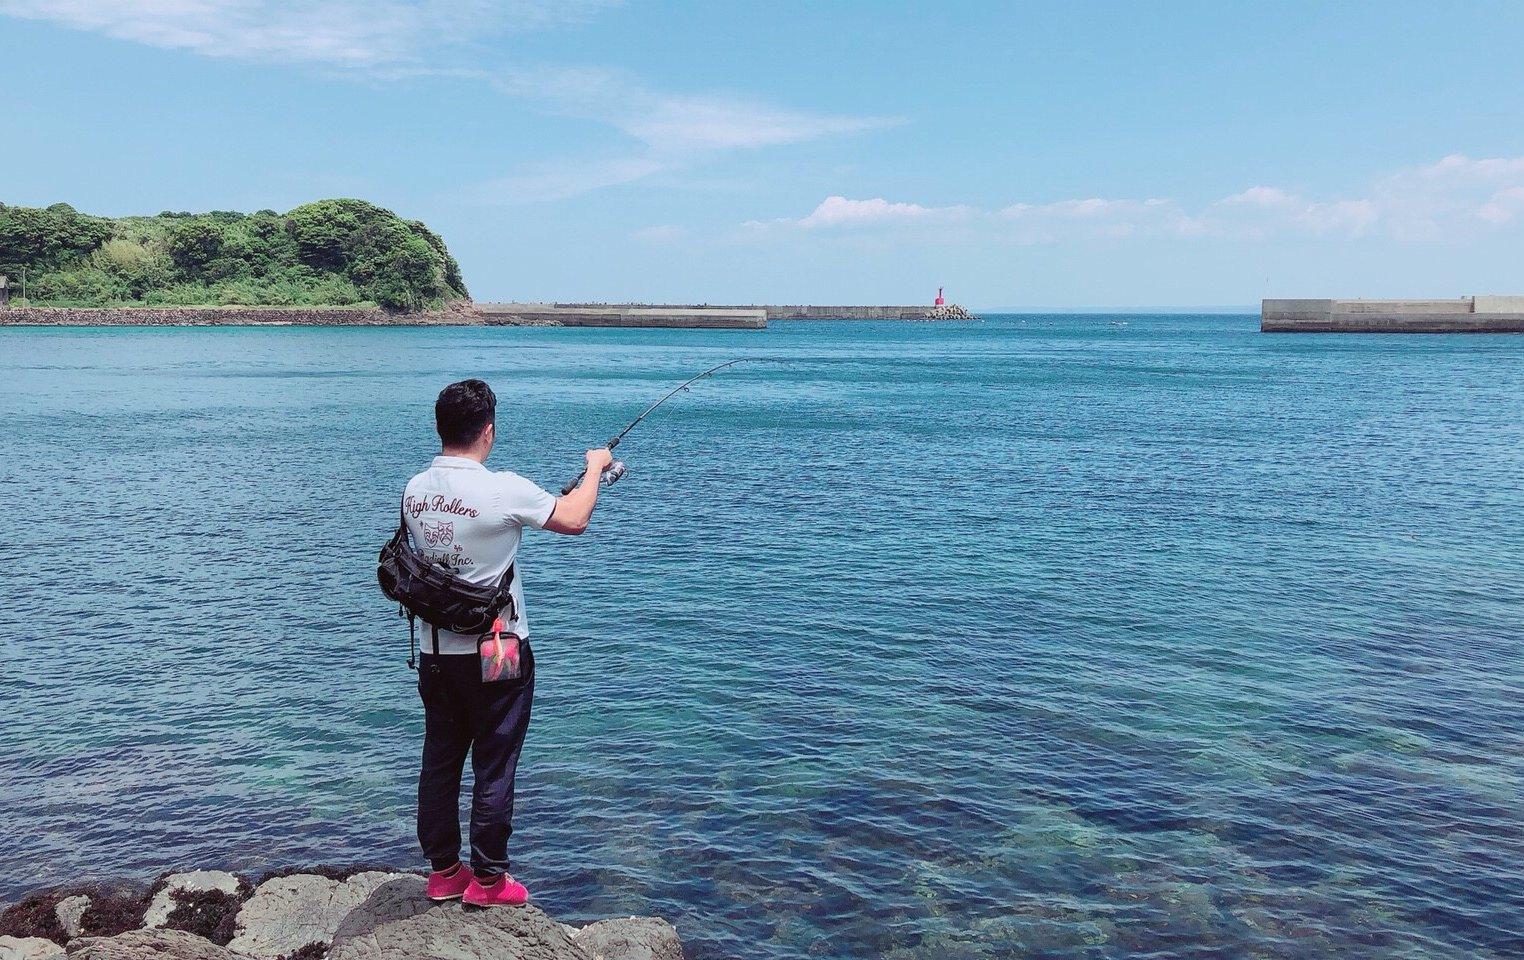 Takenori Saitoさんの背景画像